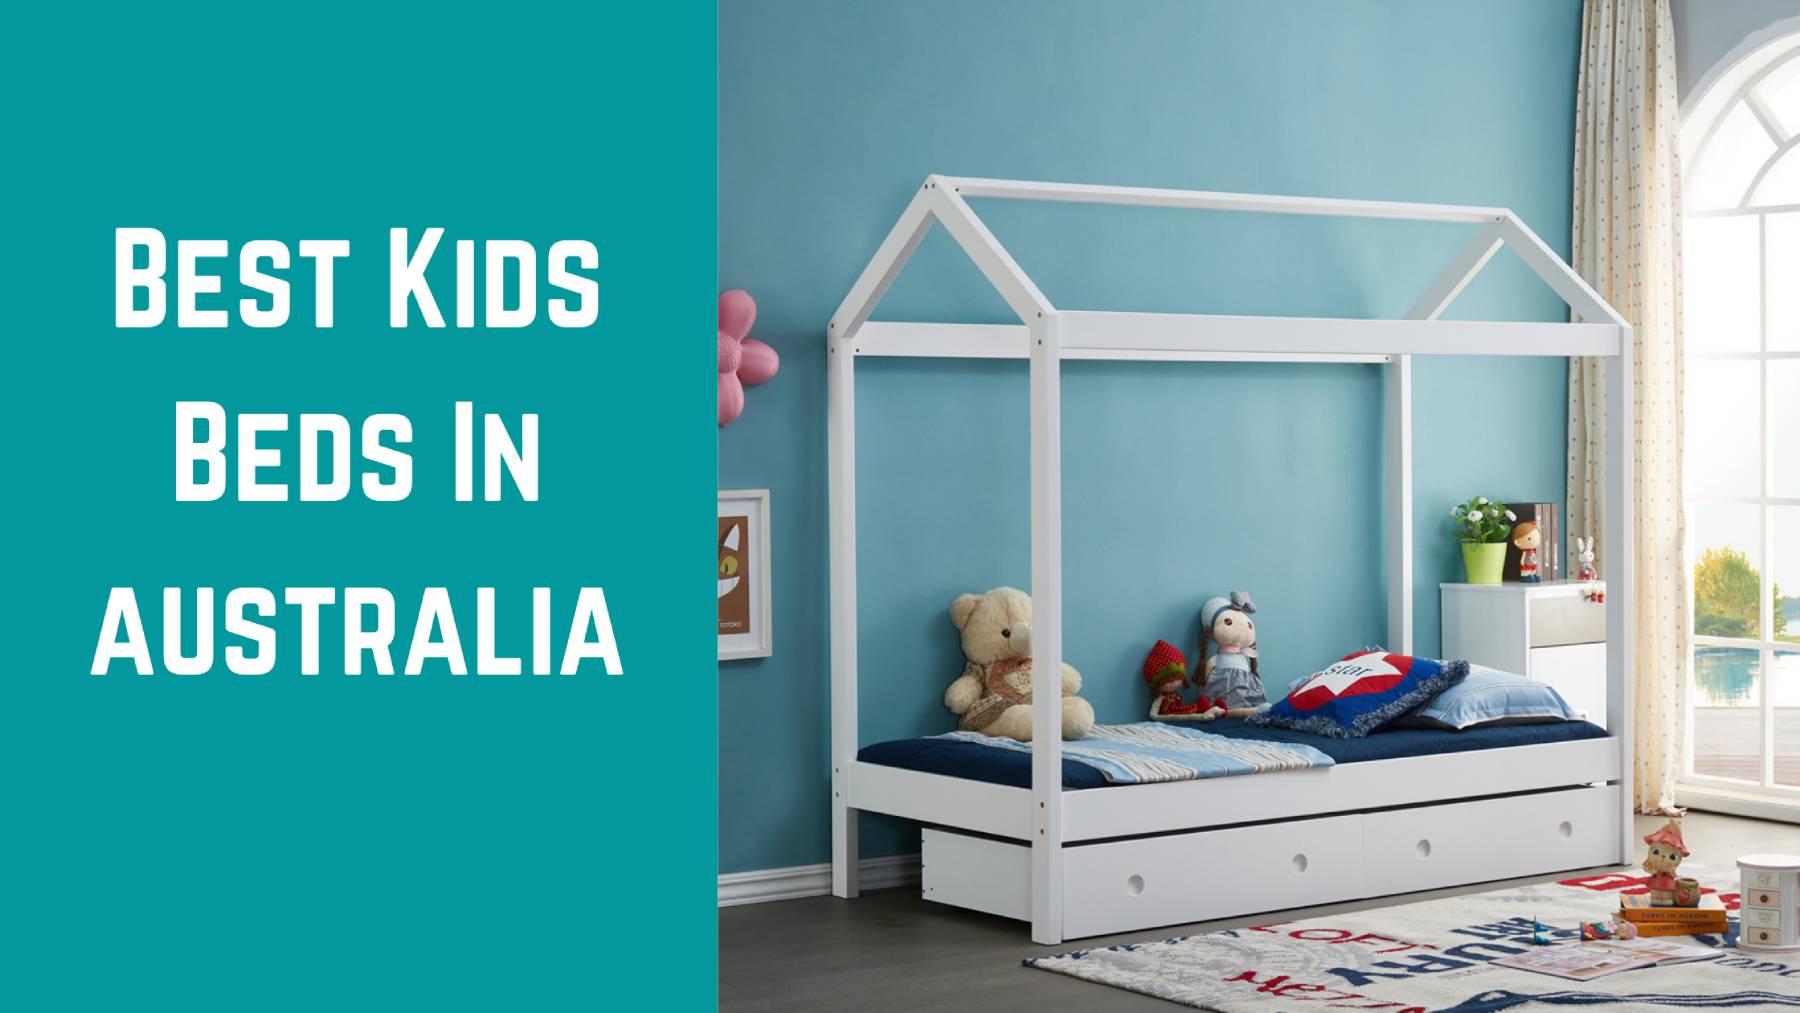 Best Kids Beds in Australia